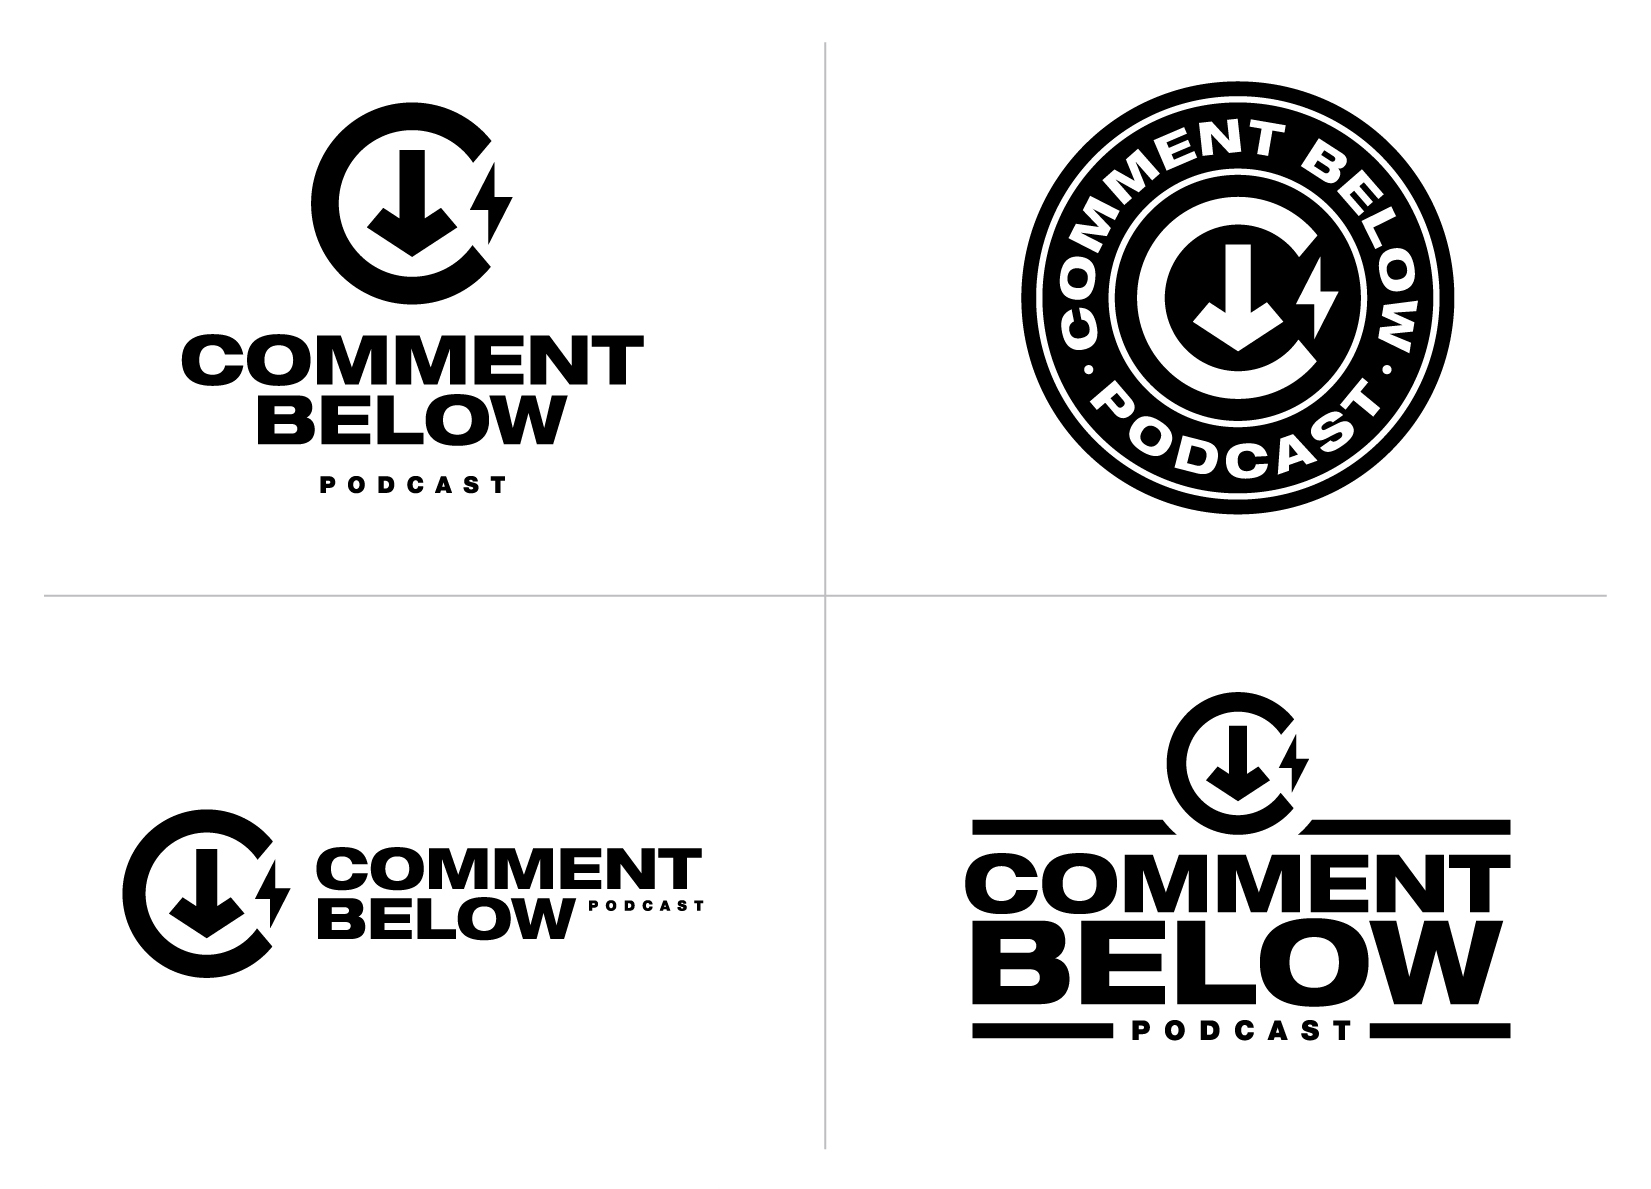 comment_below_logo_comp1.jpg